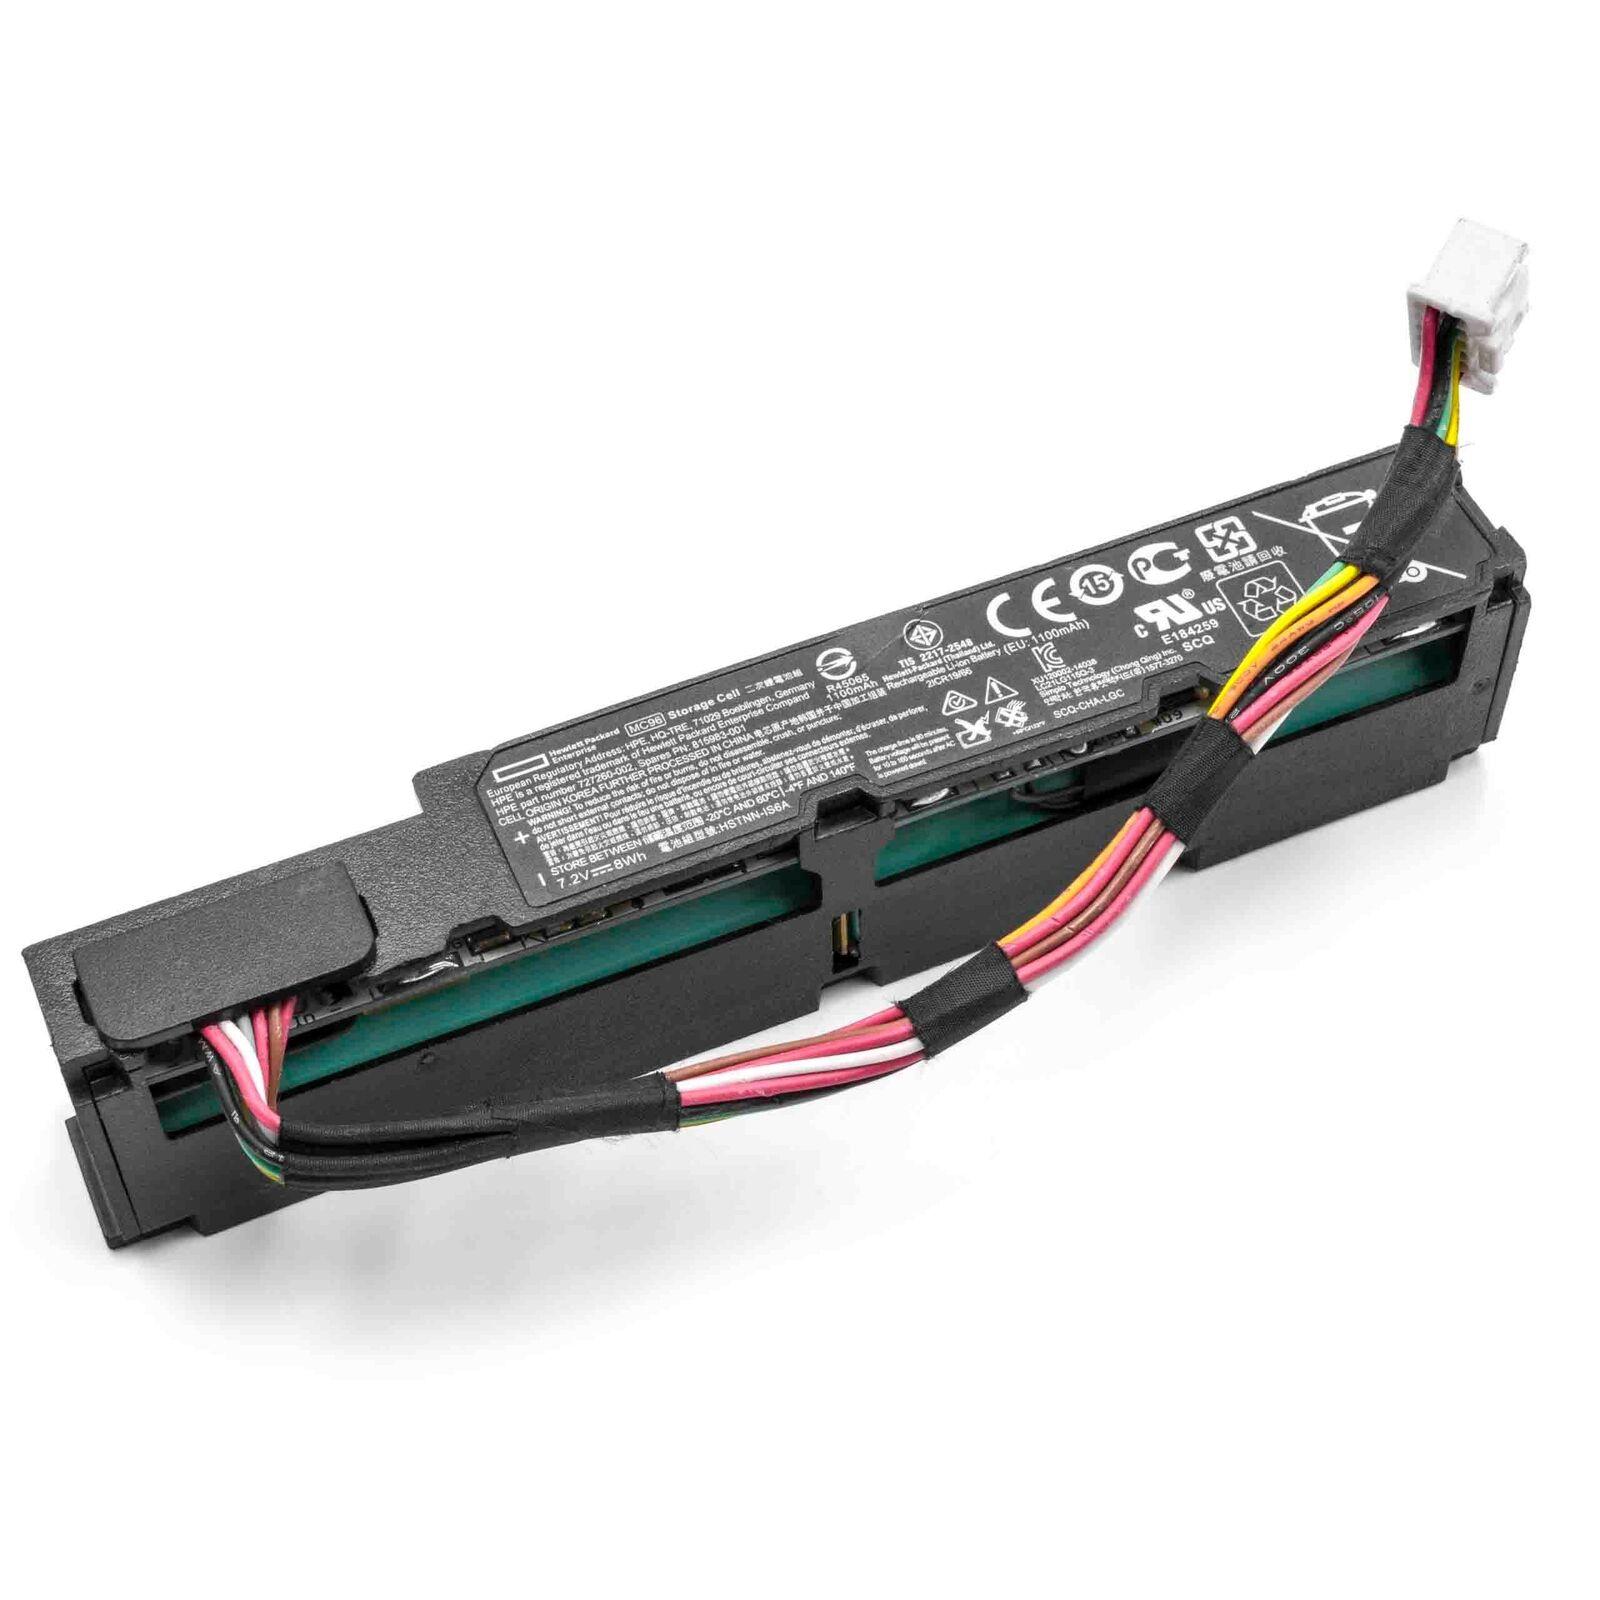 Akku für HP Smart Array P840 P440 MC96 815983-001 871264-001 727260-002(Ersatz)